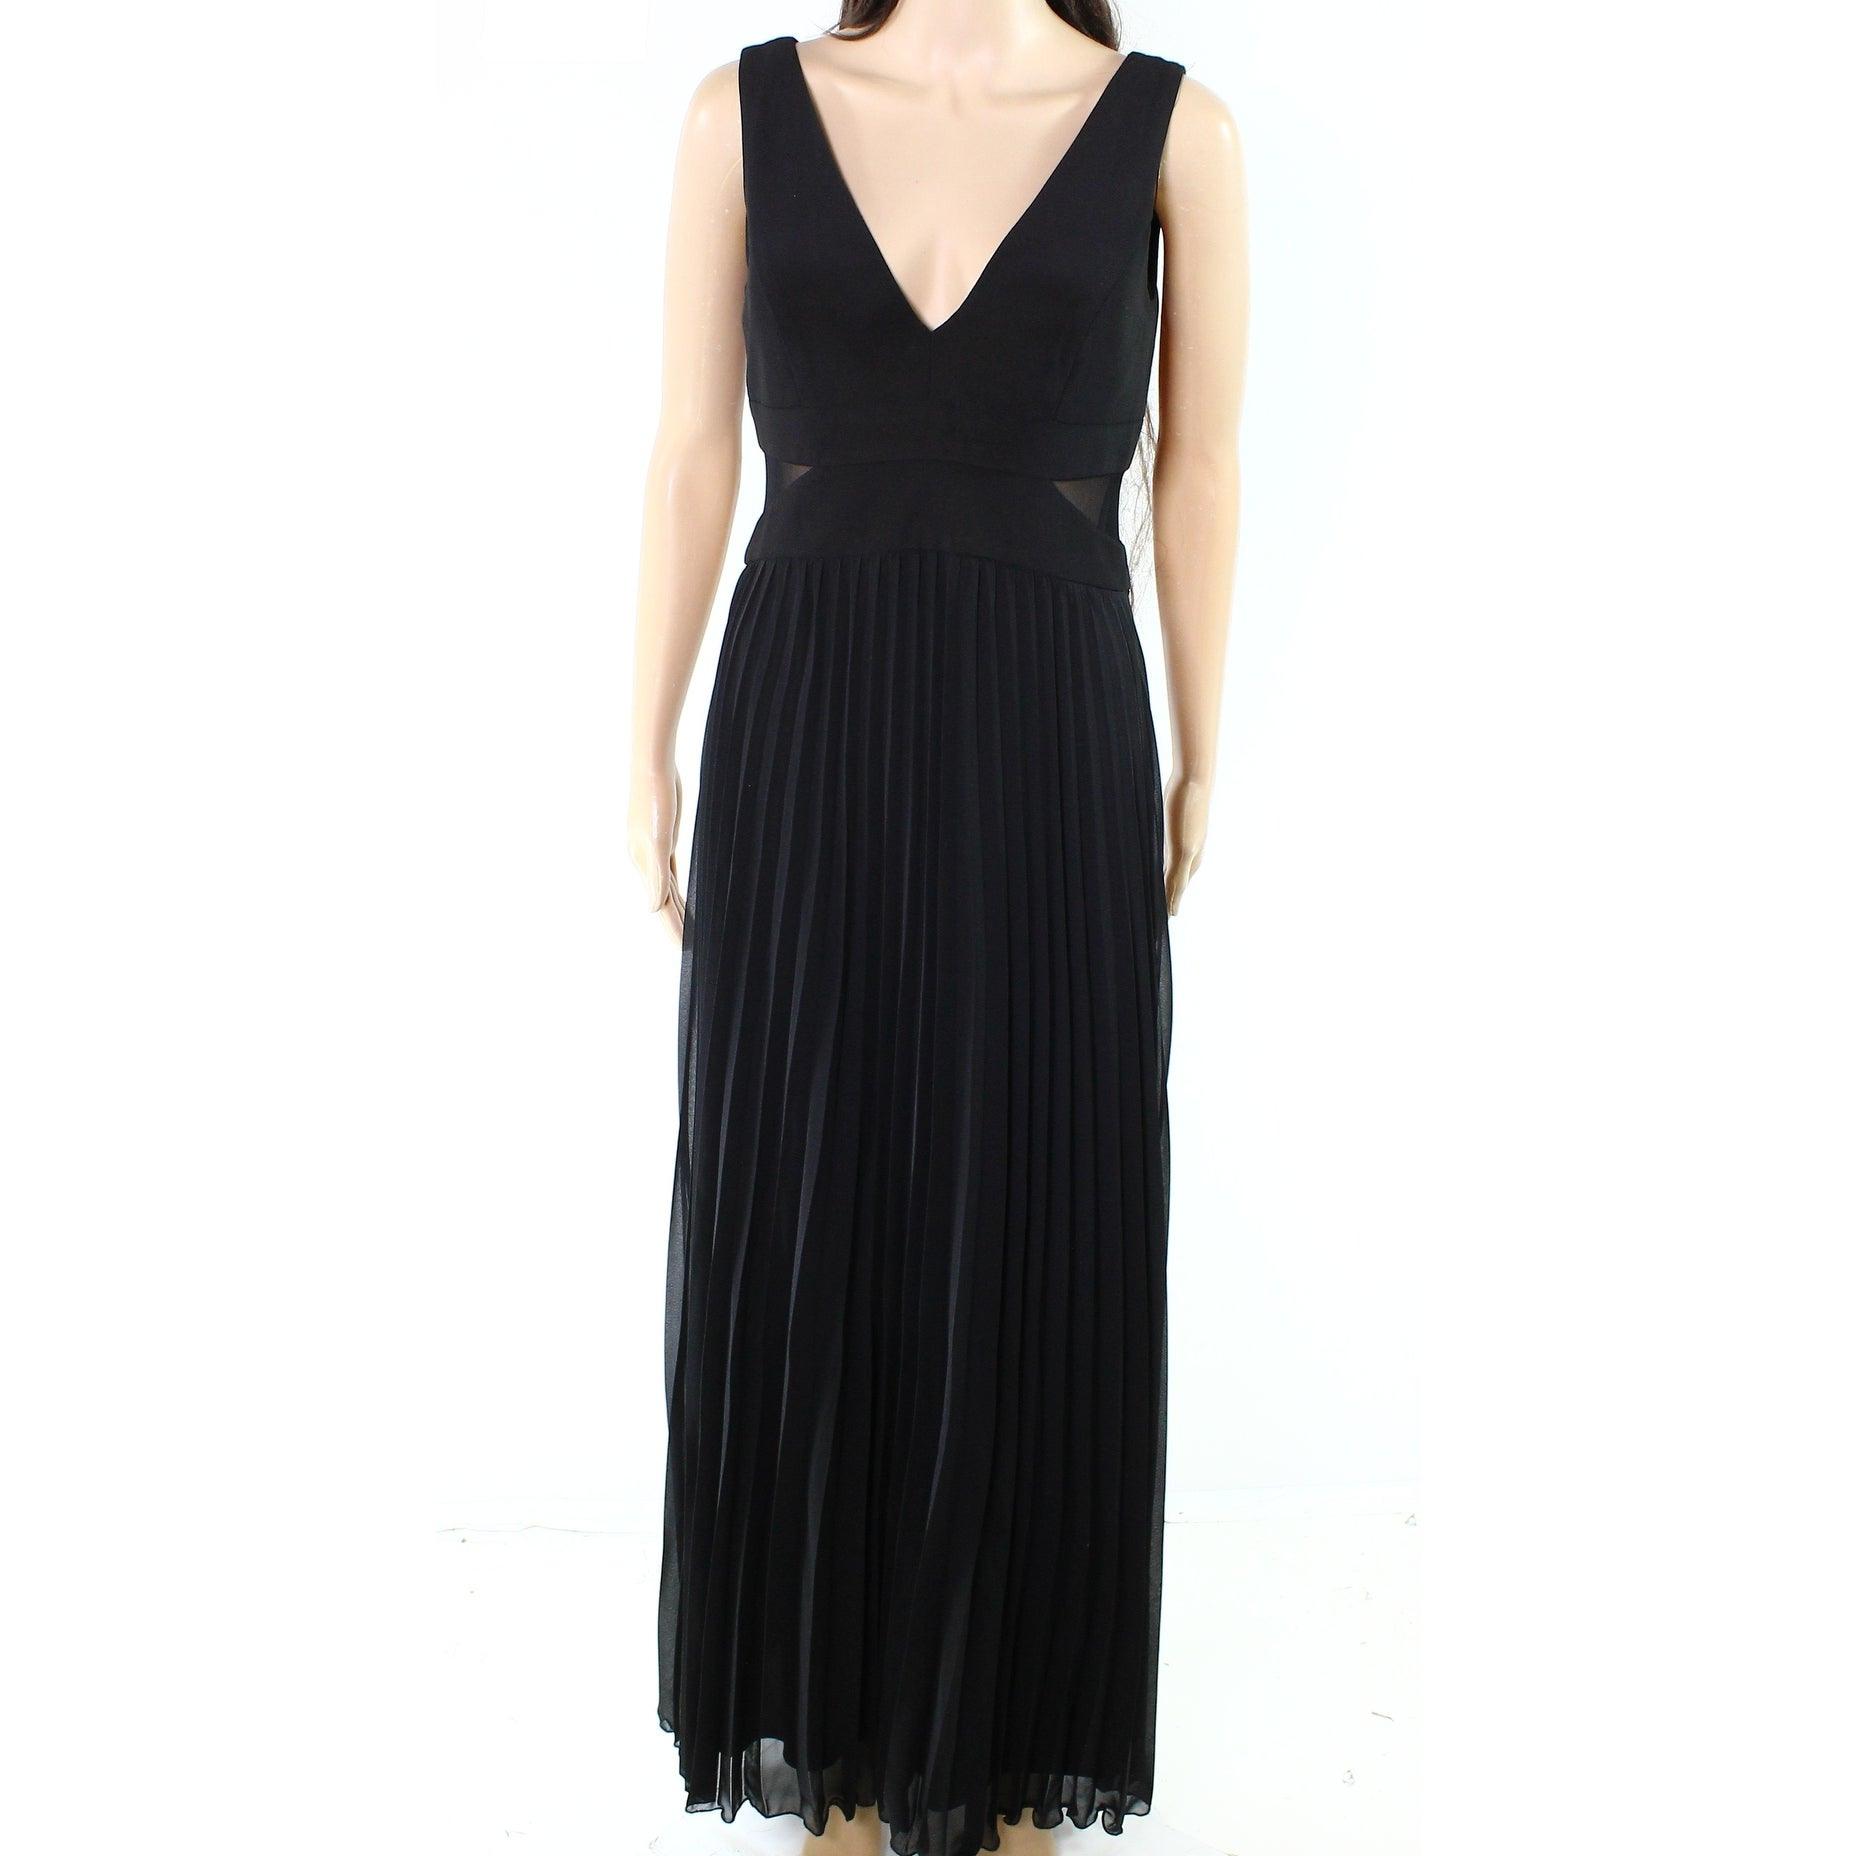 15 Genial Xscape Abendkleid ÄrmelFormal Luxus Xscape Abendkleid Ärmel